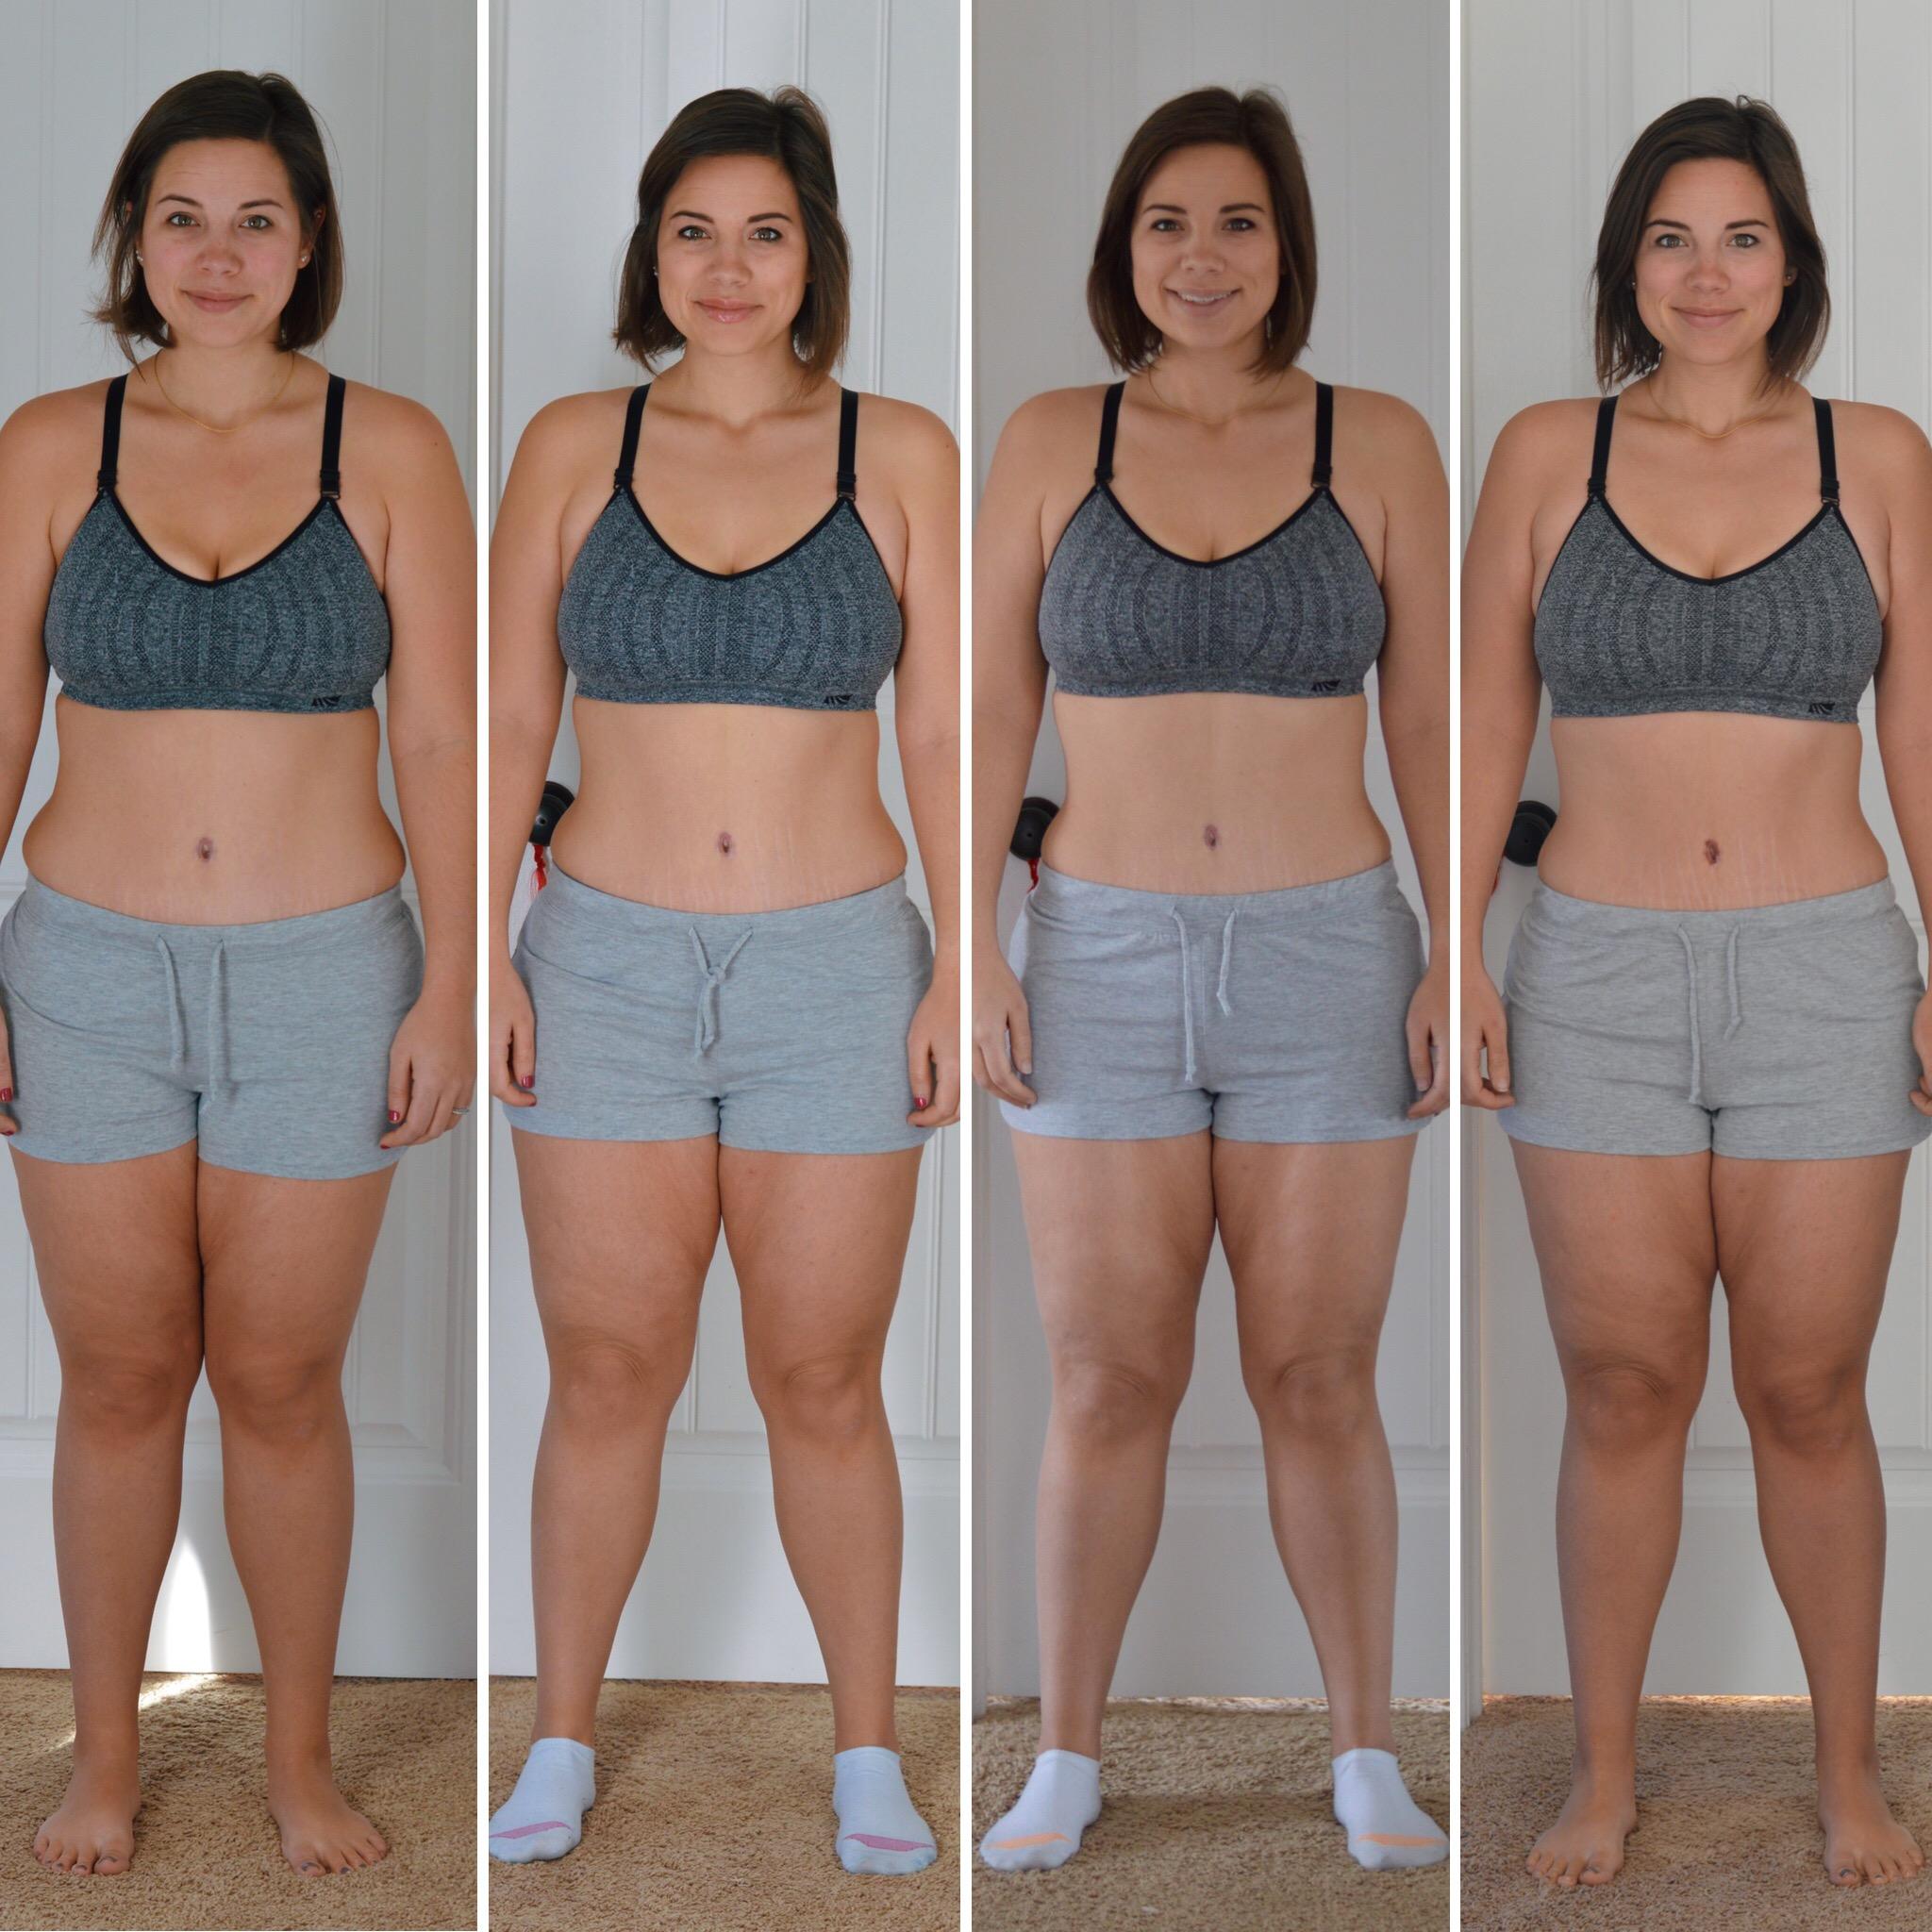 three+week+weight+loss+plateau